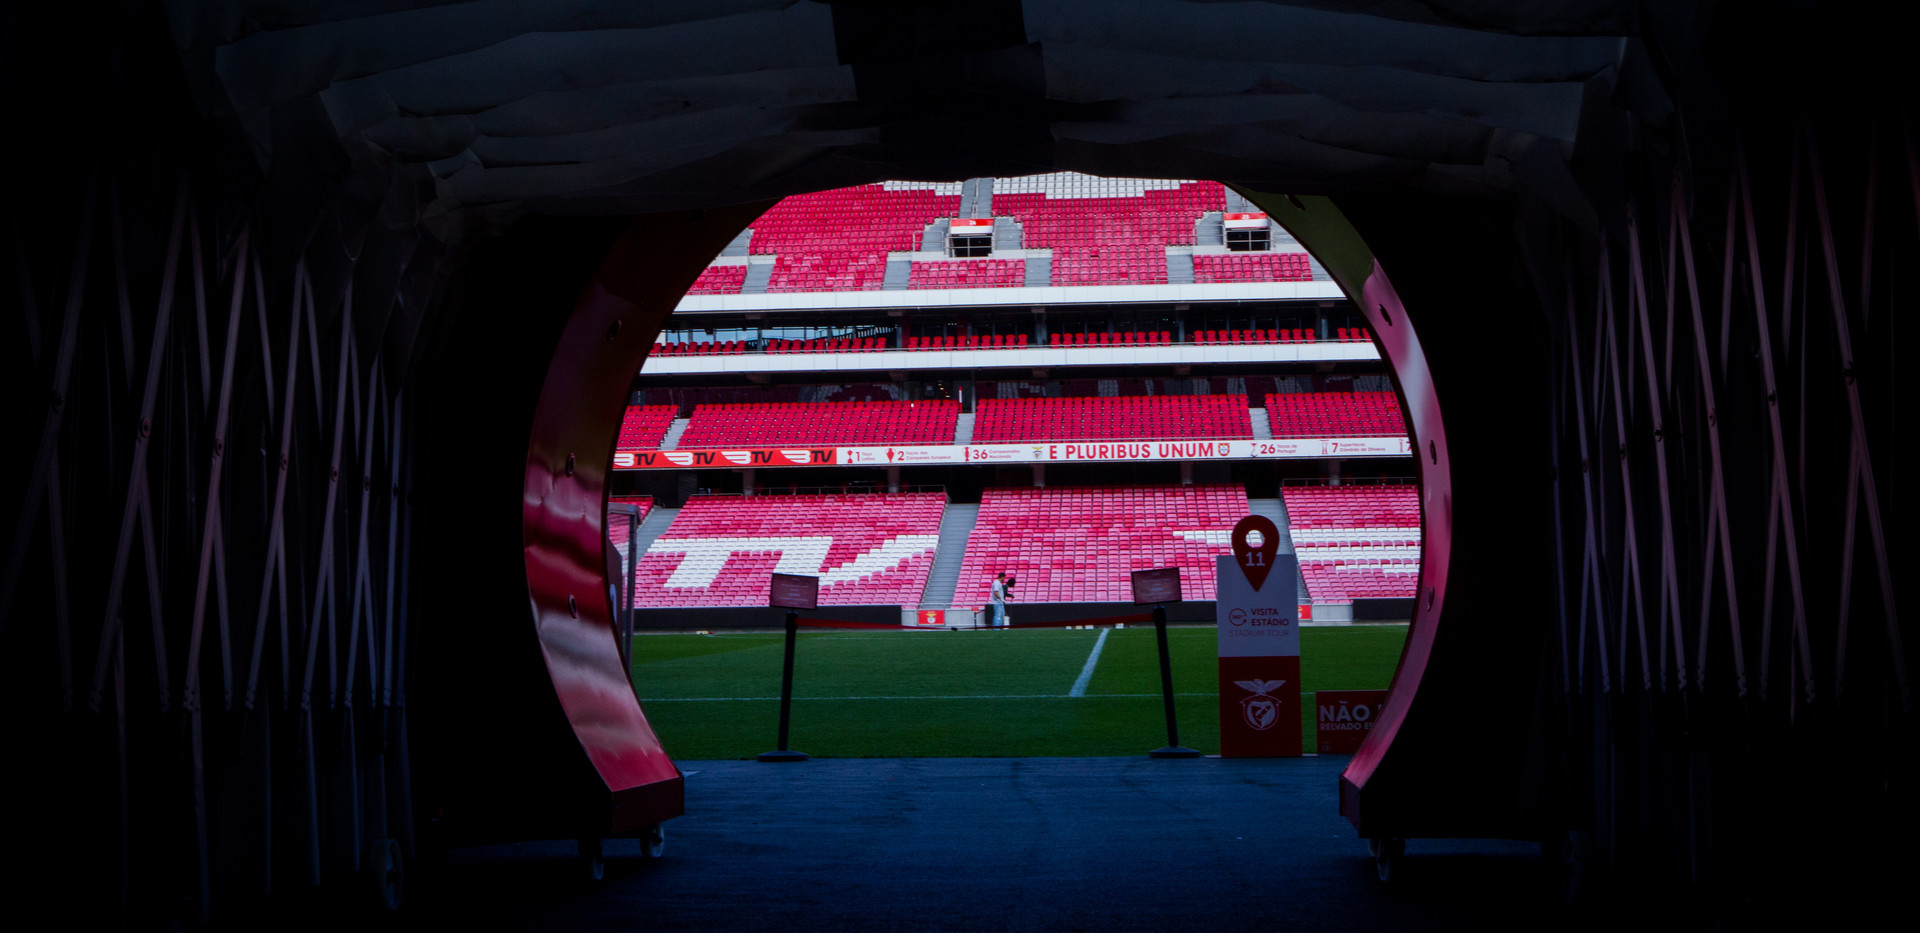 Estádio Benfica